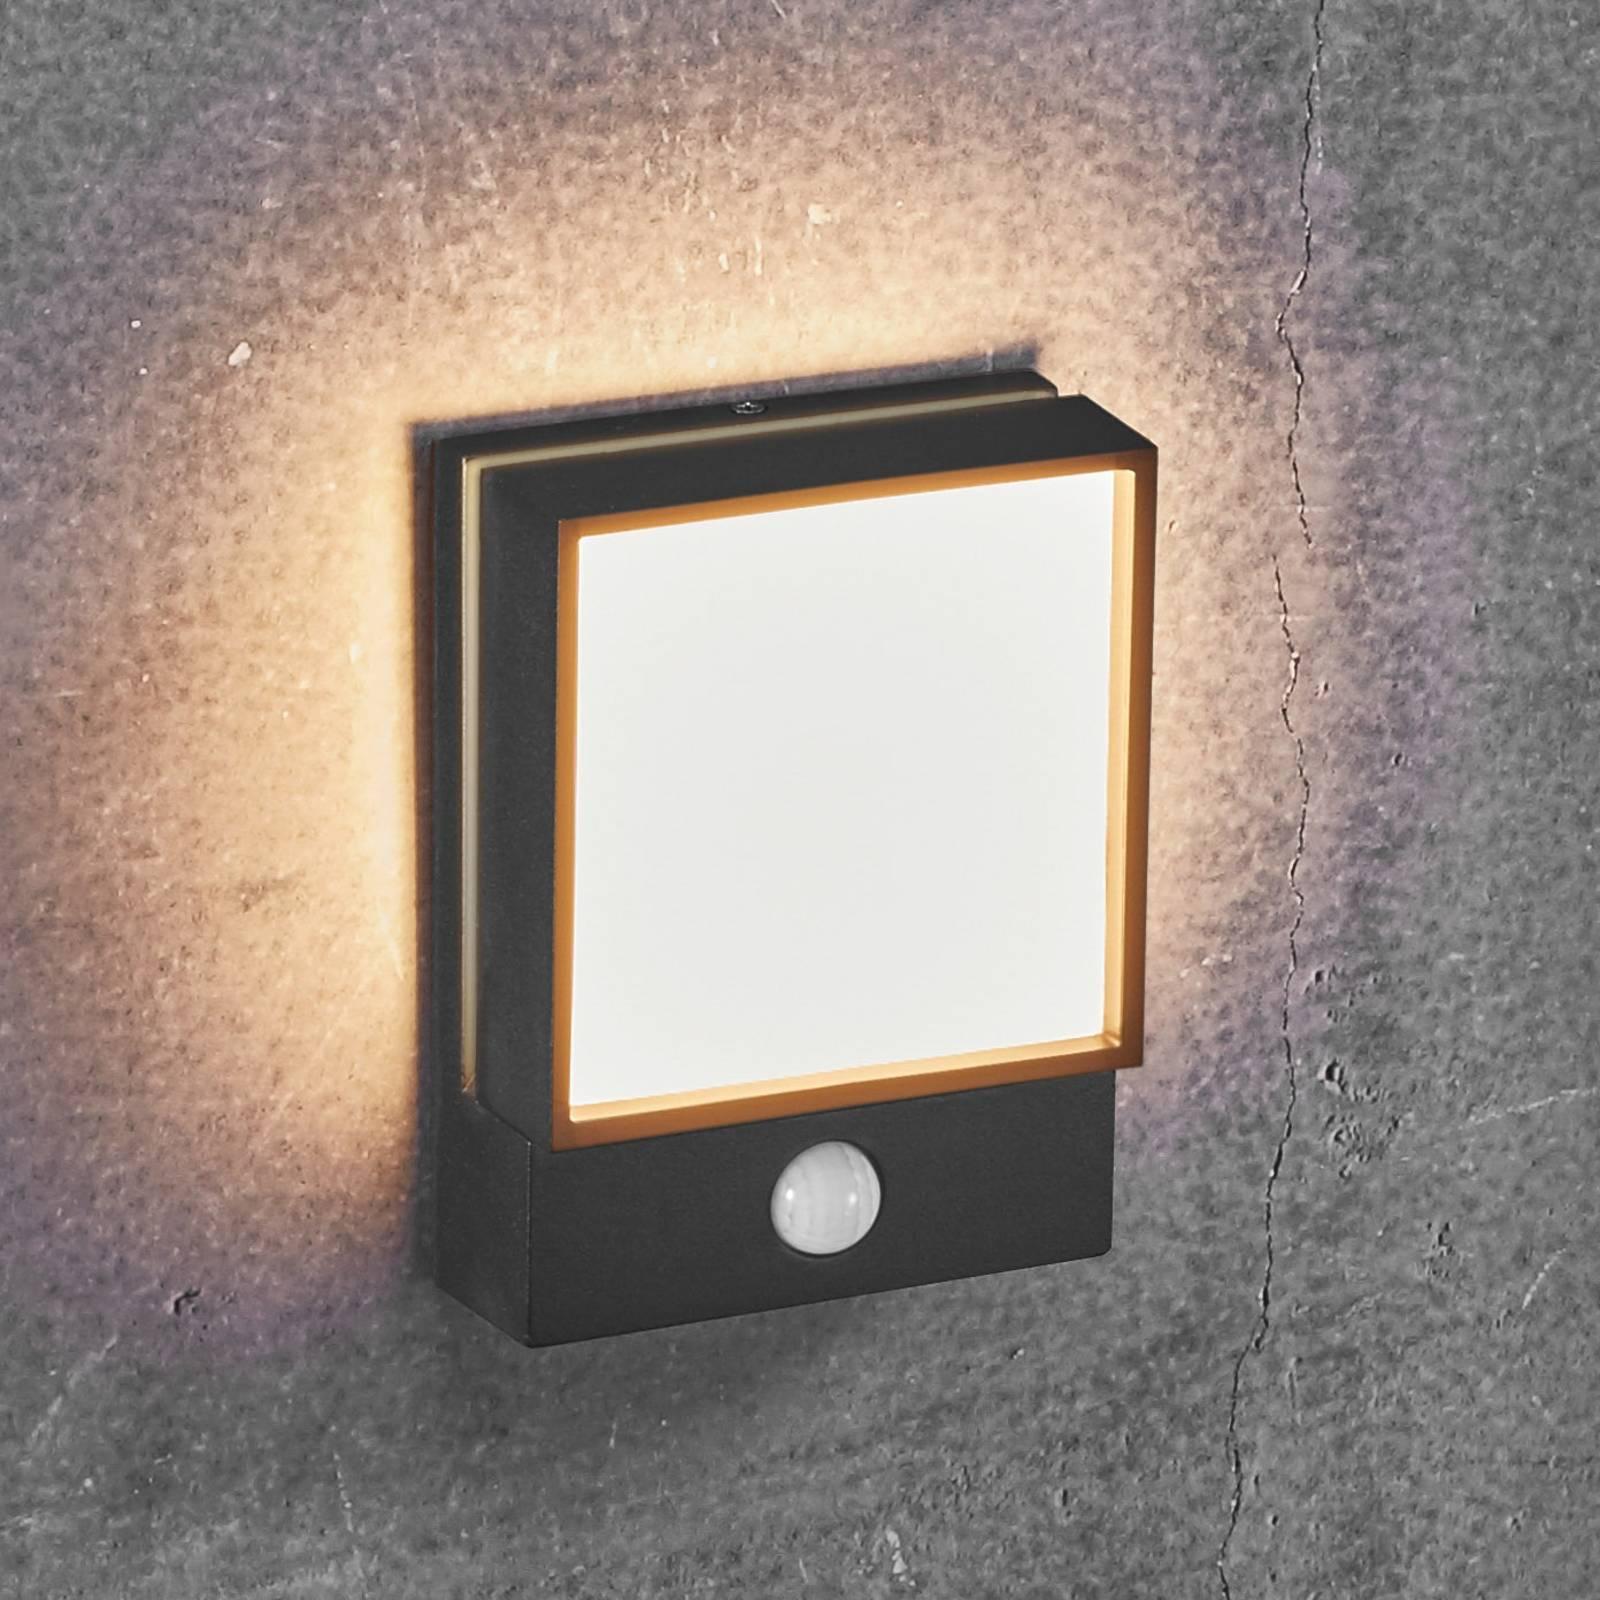 LED-ulkoseinävalaisin Egon liiketunnistimella